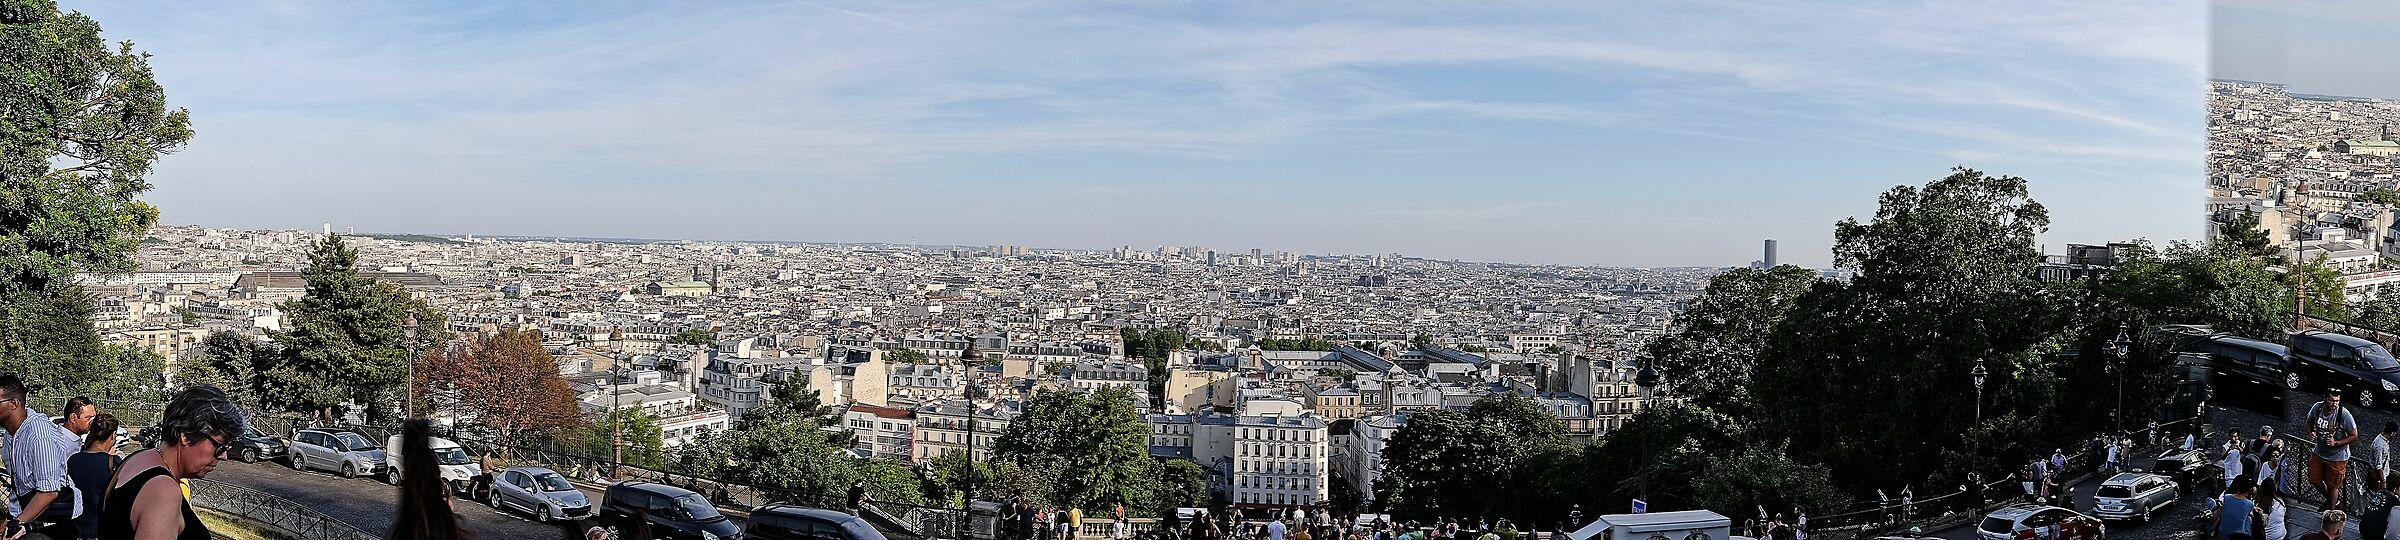 panoramica di Parigi da Montmartre...